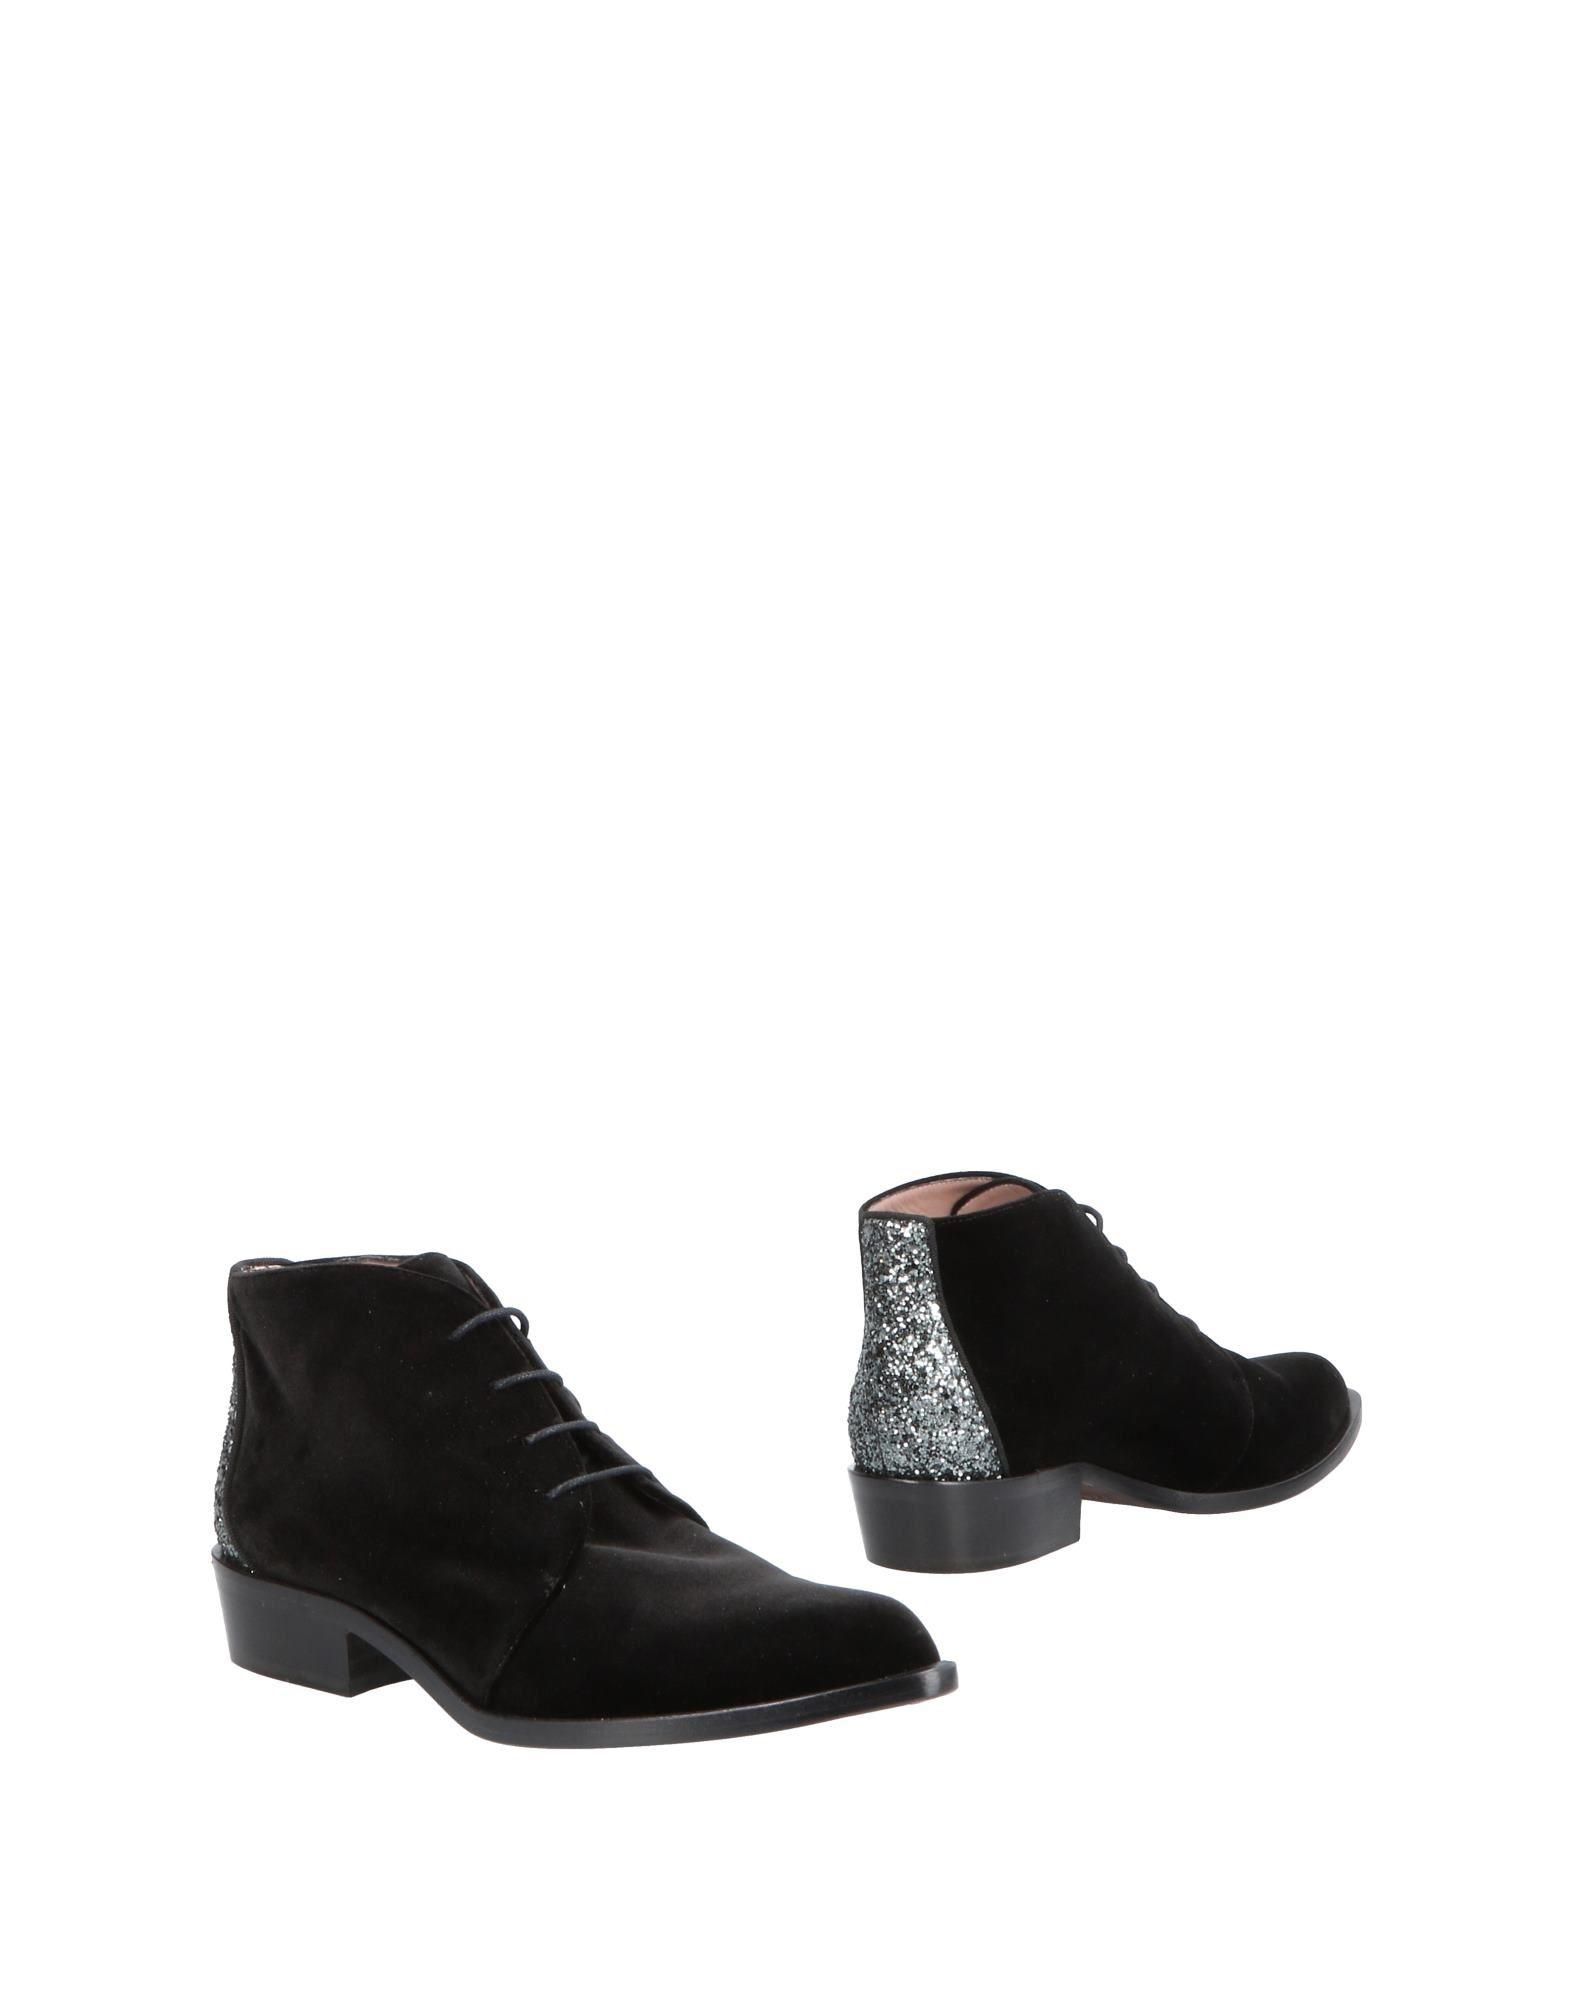 Gianna Meliani Ankle Meliani Boot - Women Gianna Meliani Ankle Ankle Boots online on  Australia - 11507046CB 320976